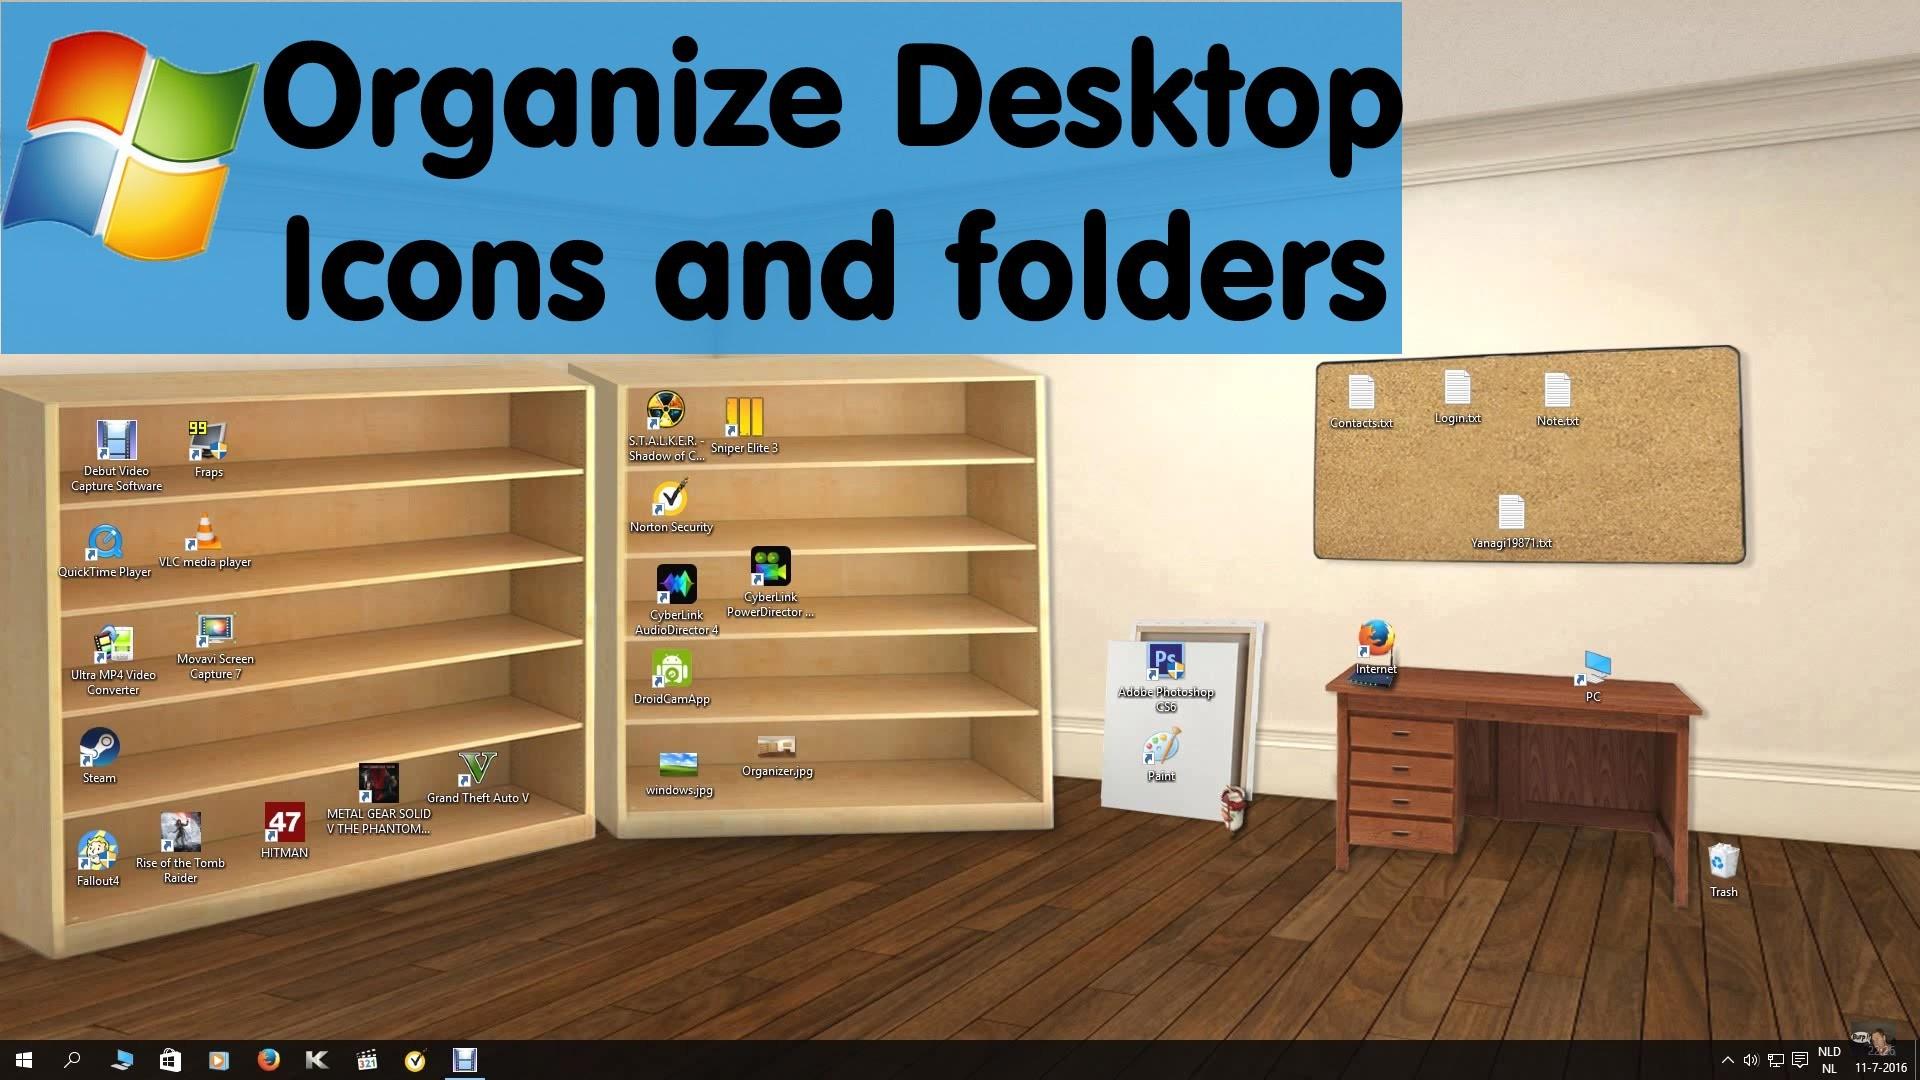 Classic 3d Desktop Workplace Wallpaper Desktop Icon Shelf Wallpaper 66 Images